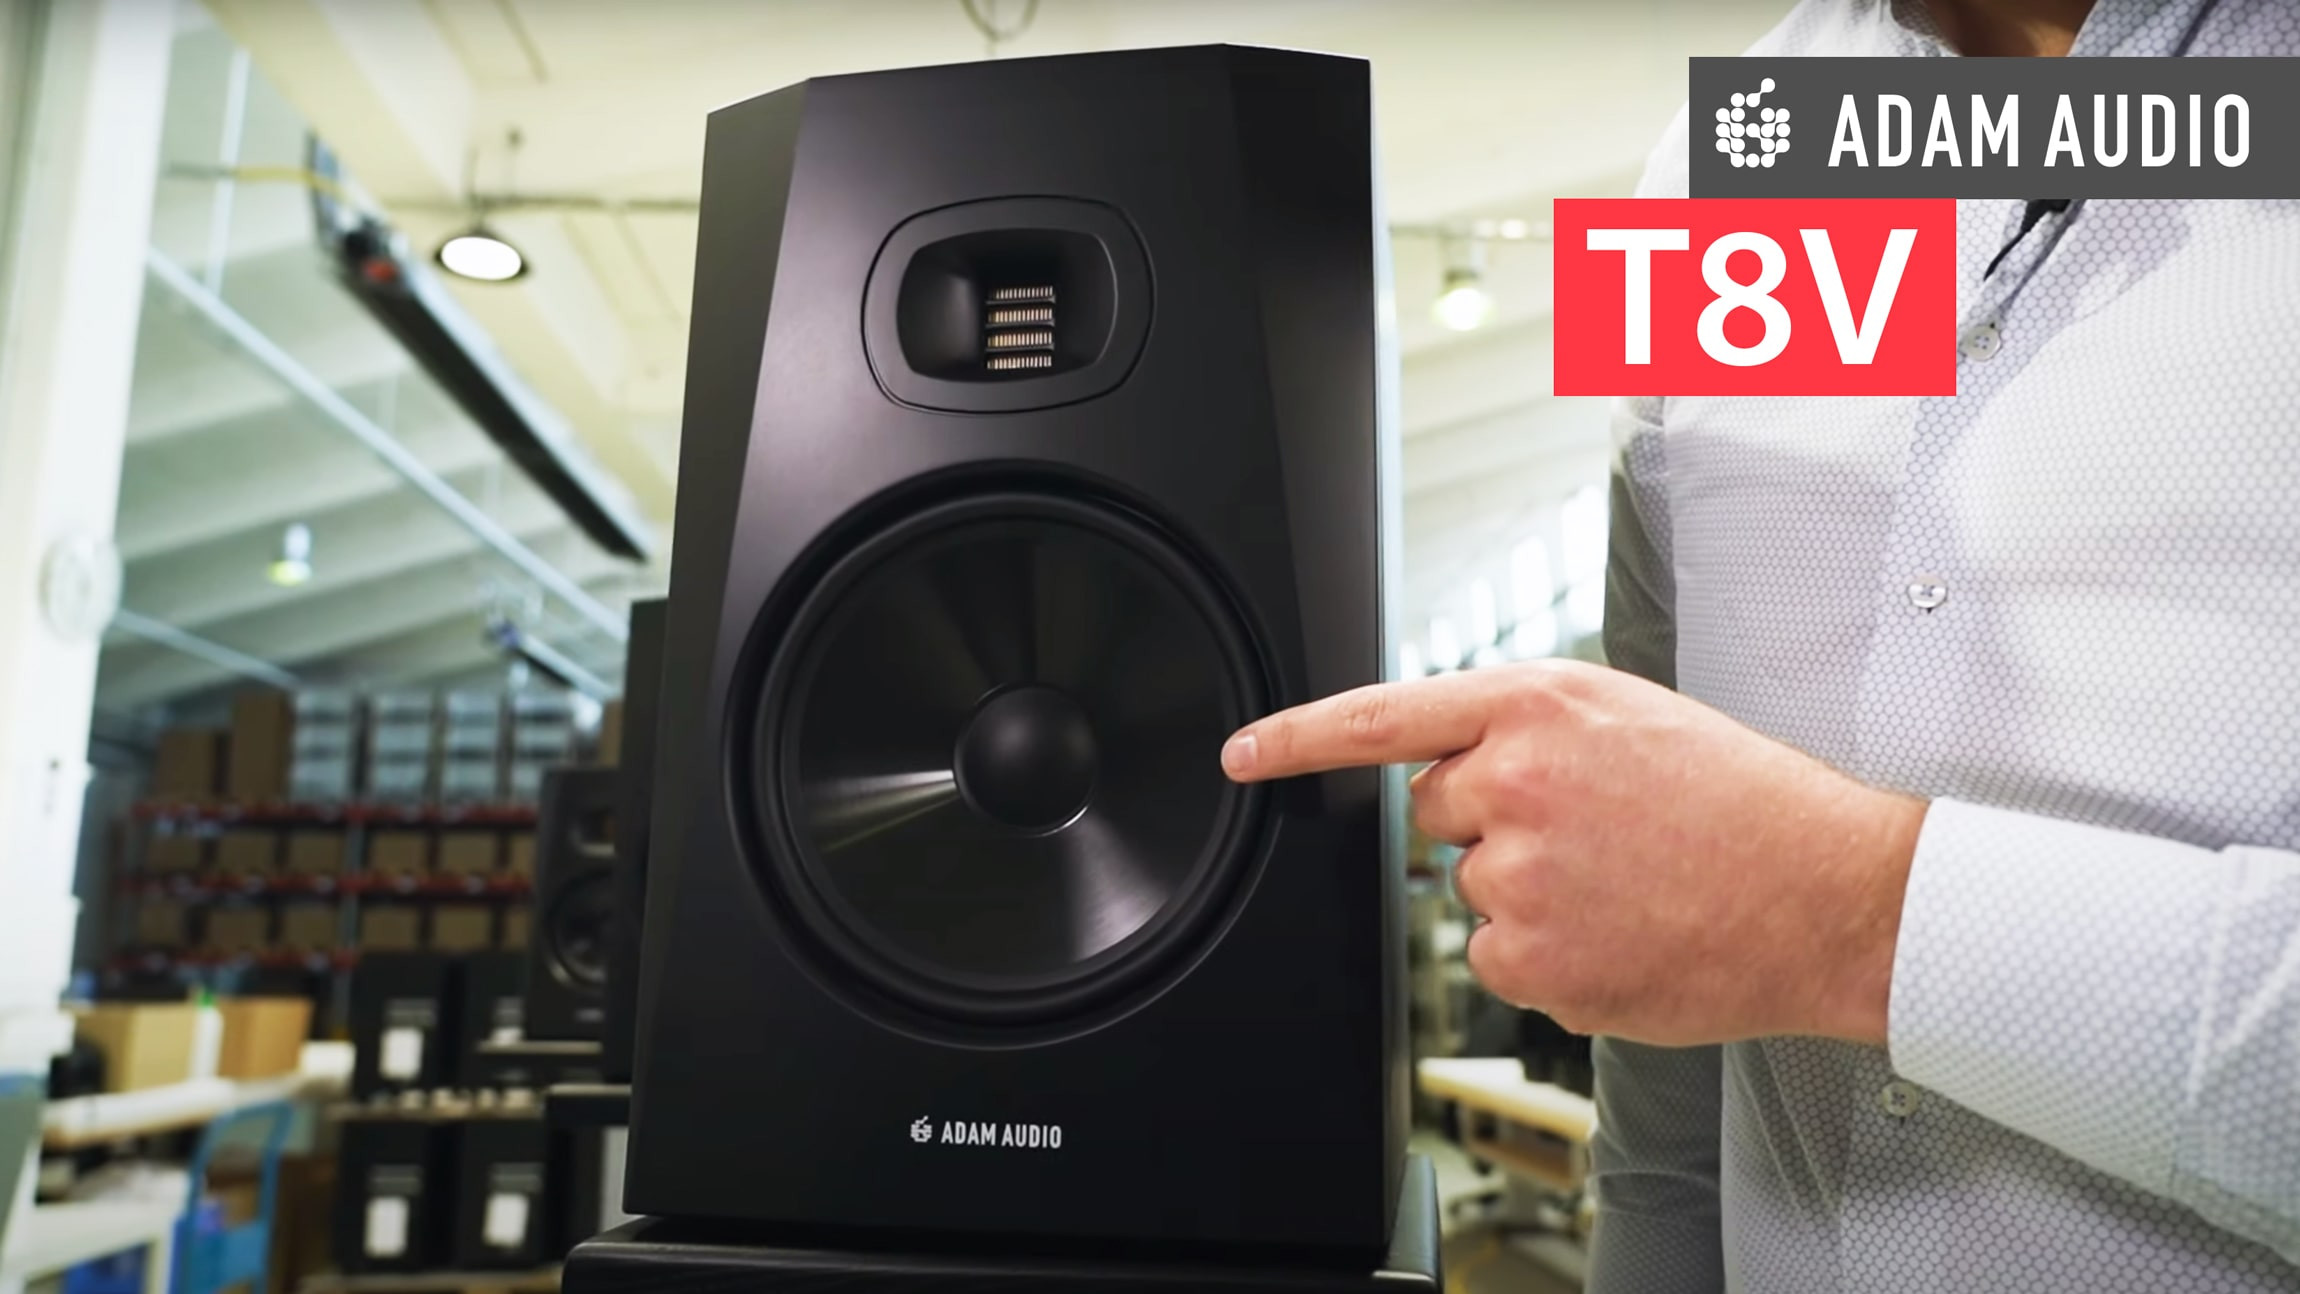 KONKURS: Zagraj o monitory ADAM Audio T8V